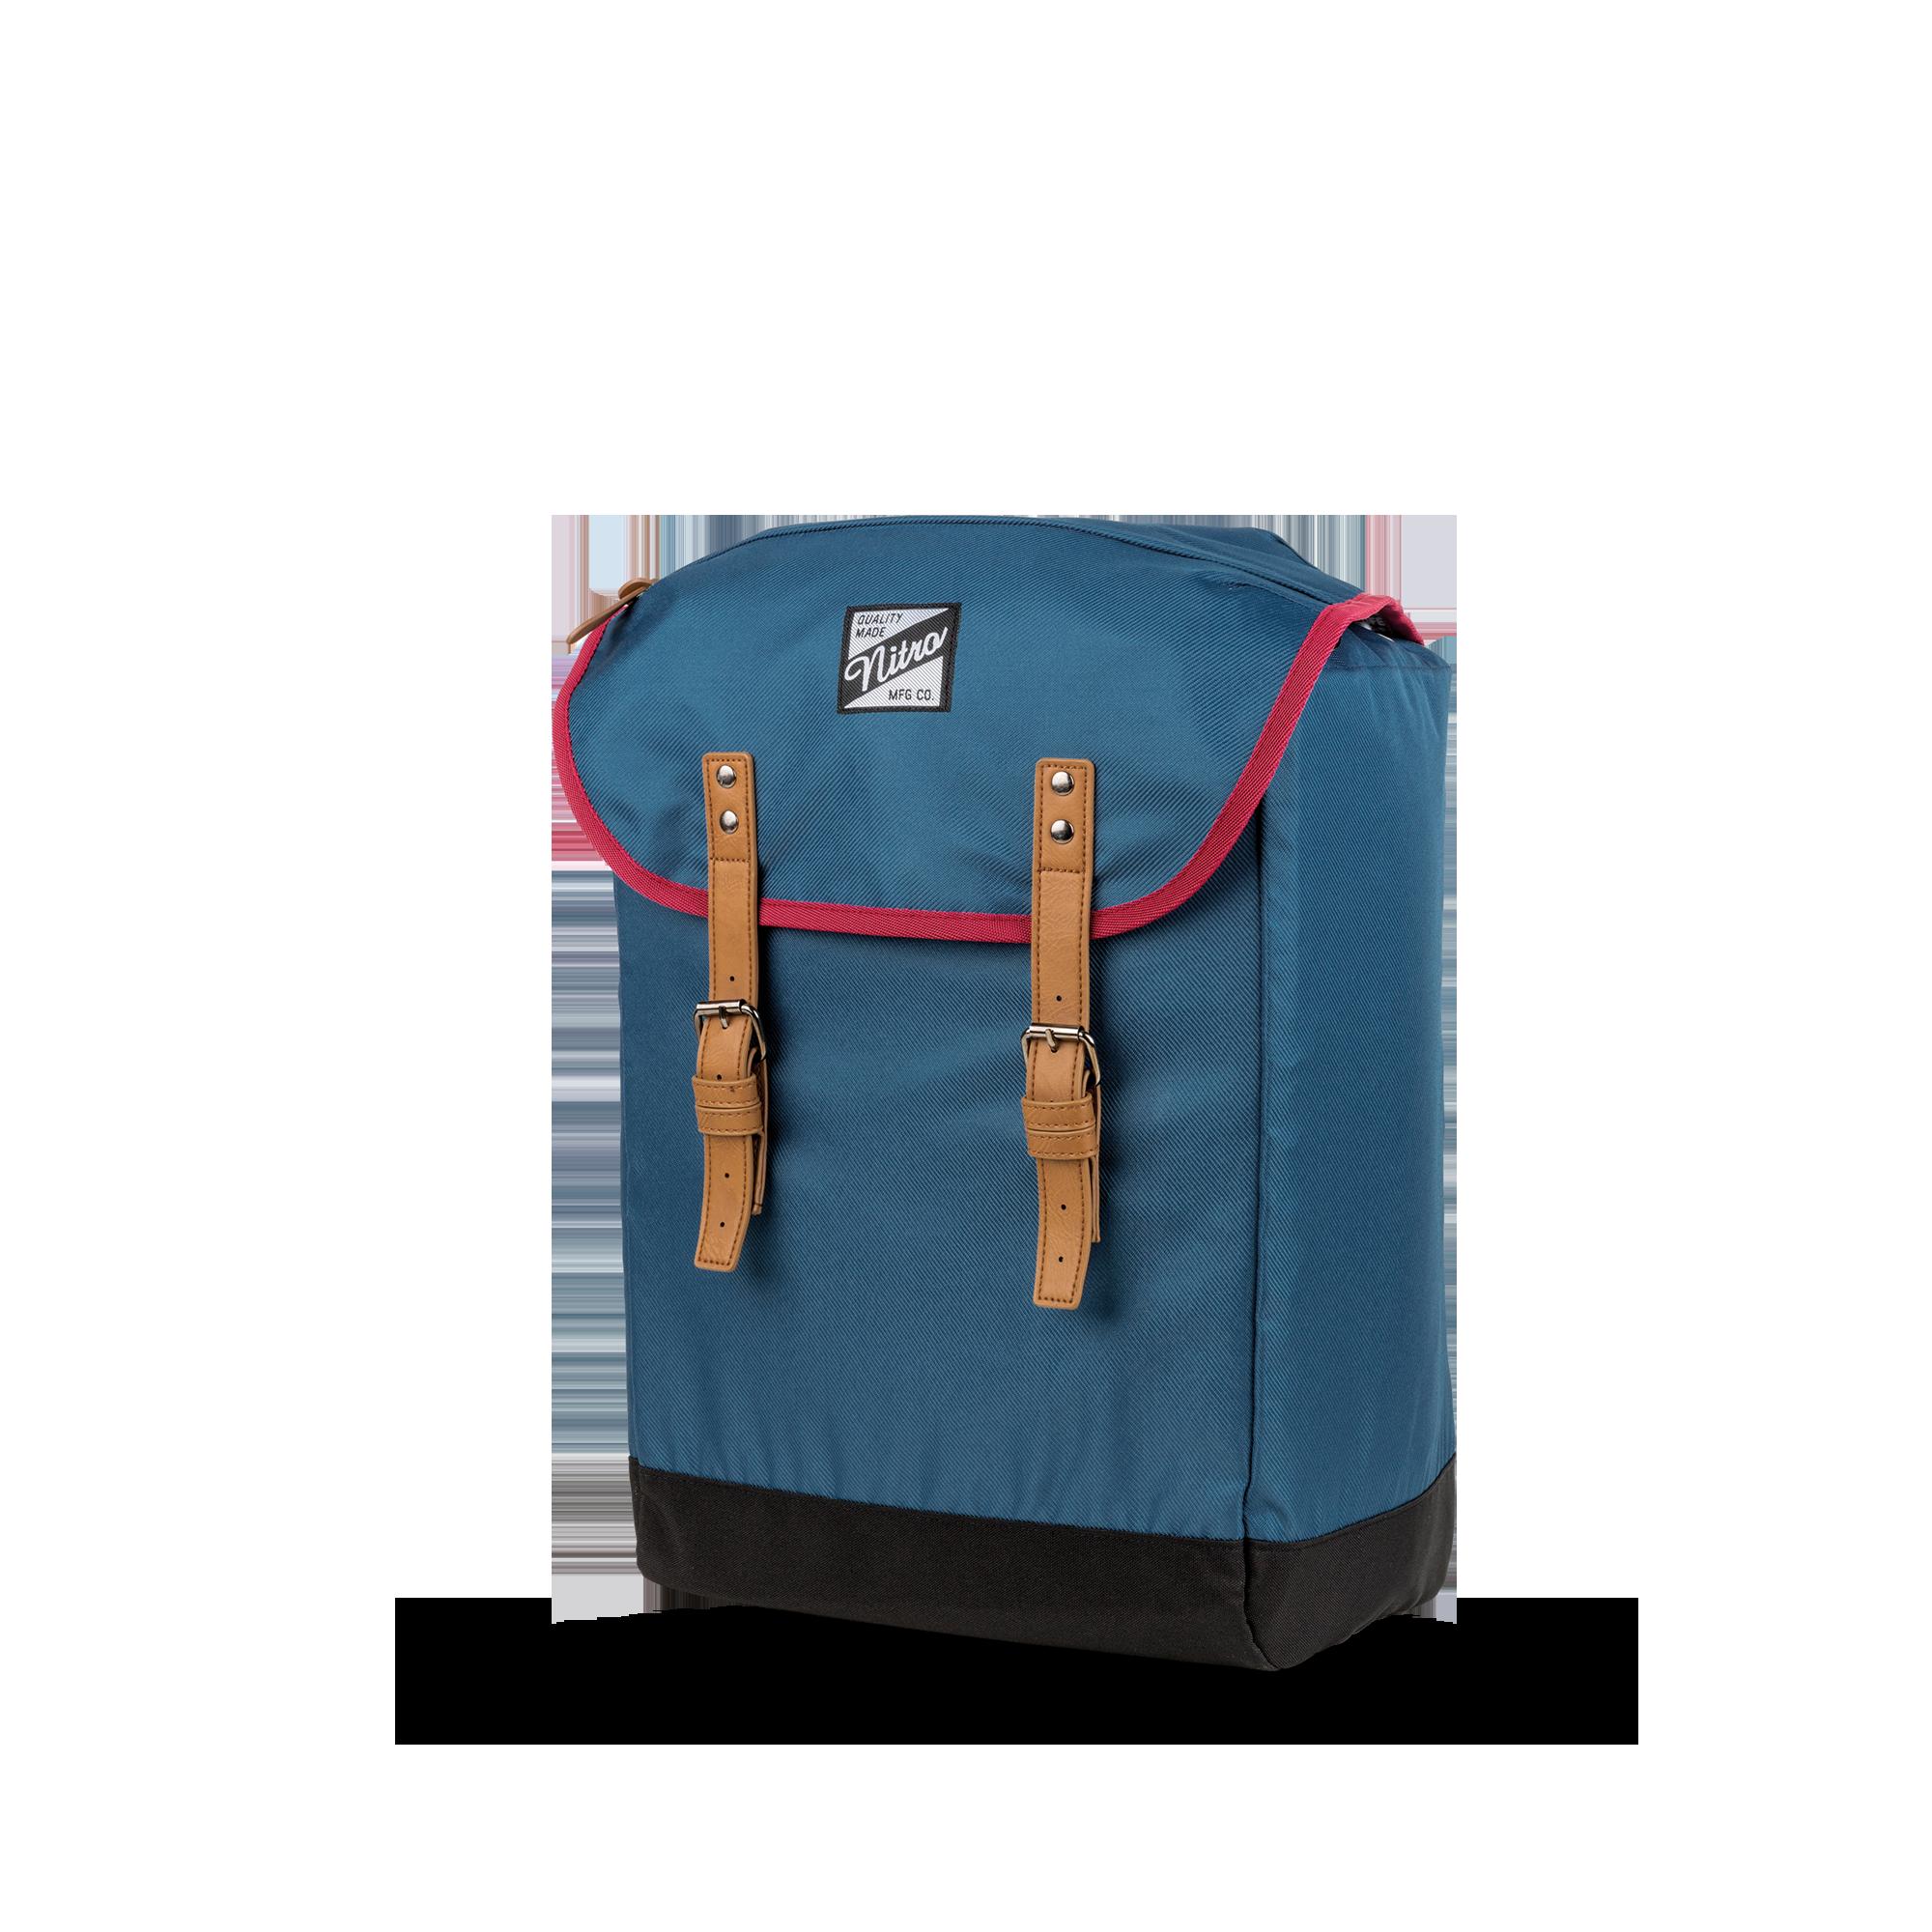 Venice Nitro Bags In 2020 Bags Flap Pocket Tablet Sleeve